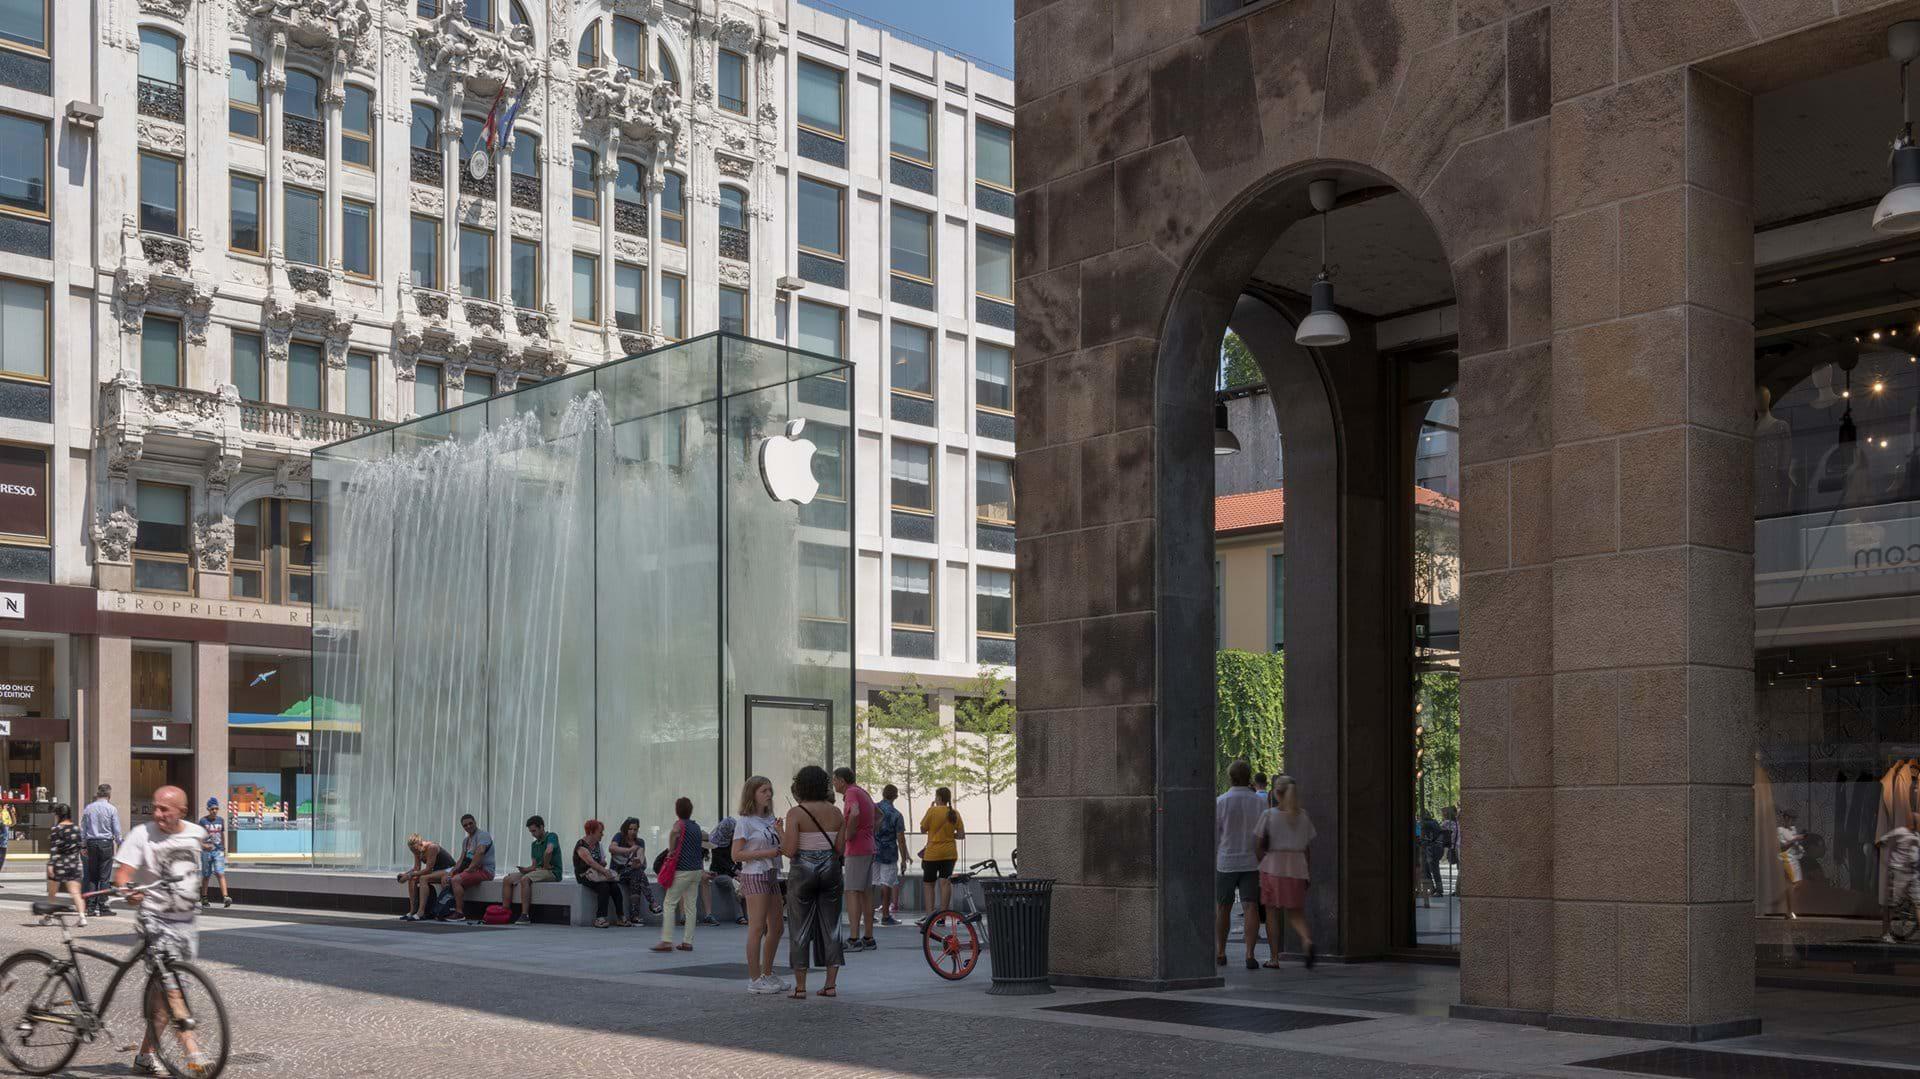 apple store milan photo form vittorio emanuele str.